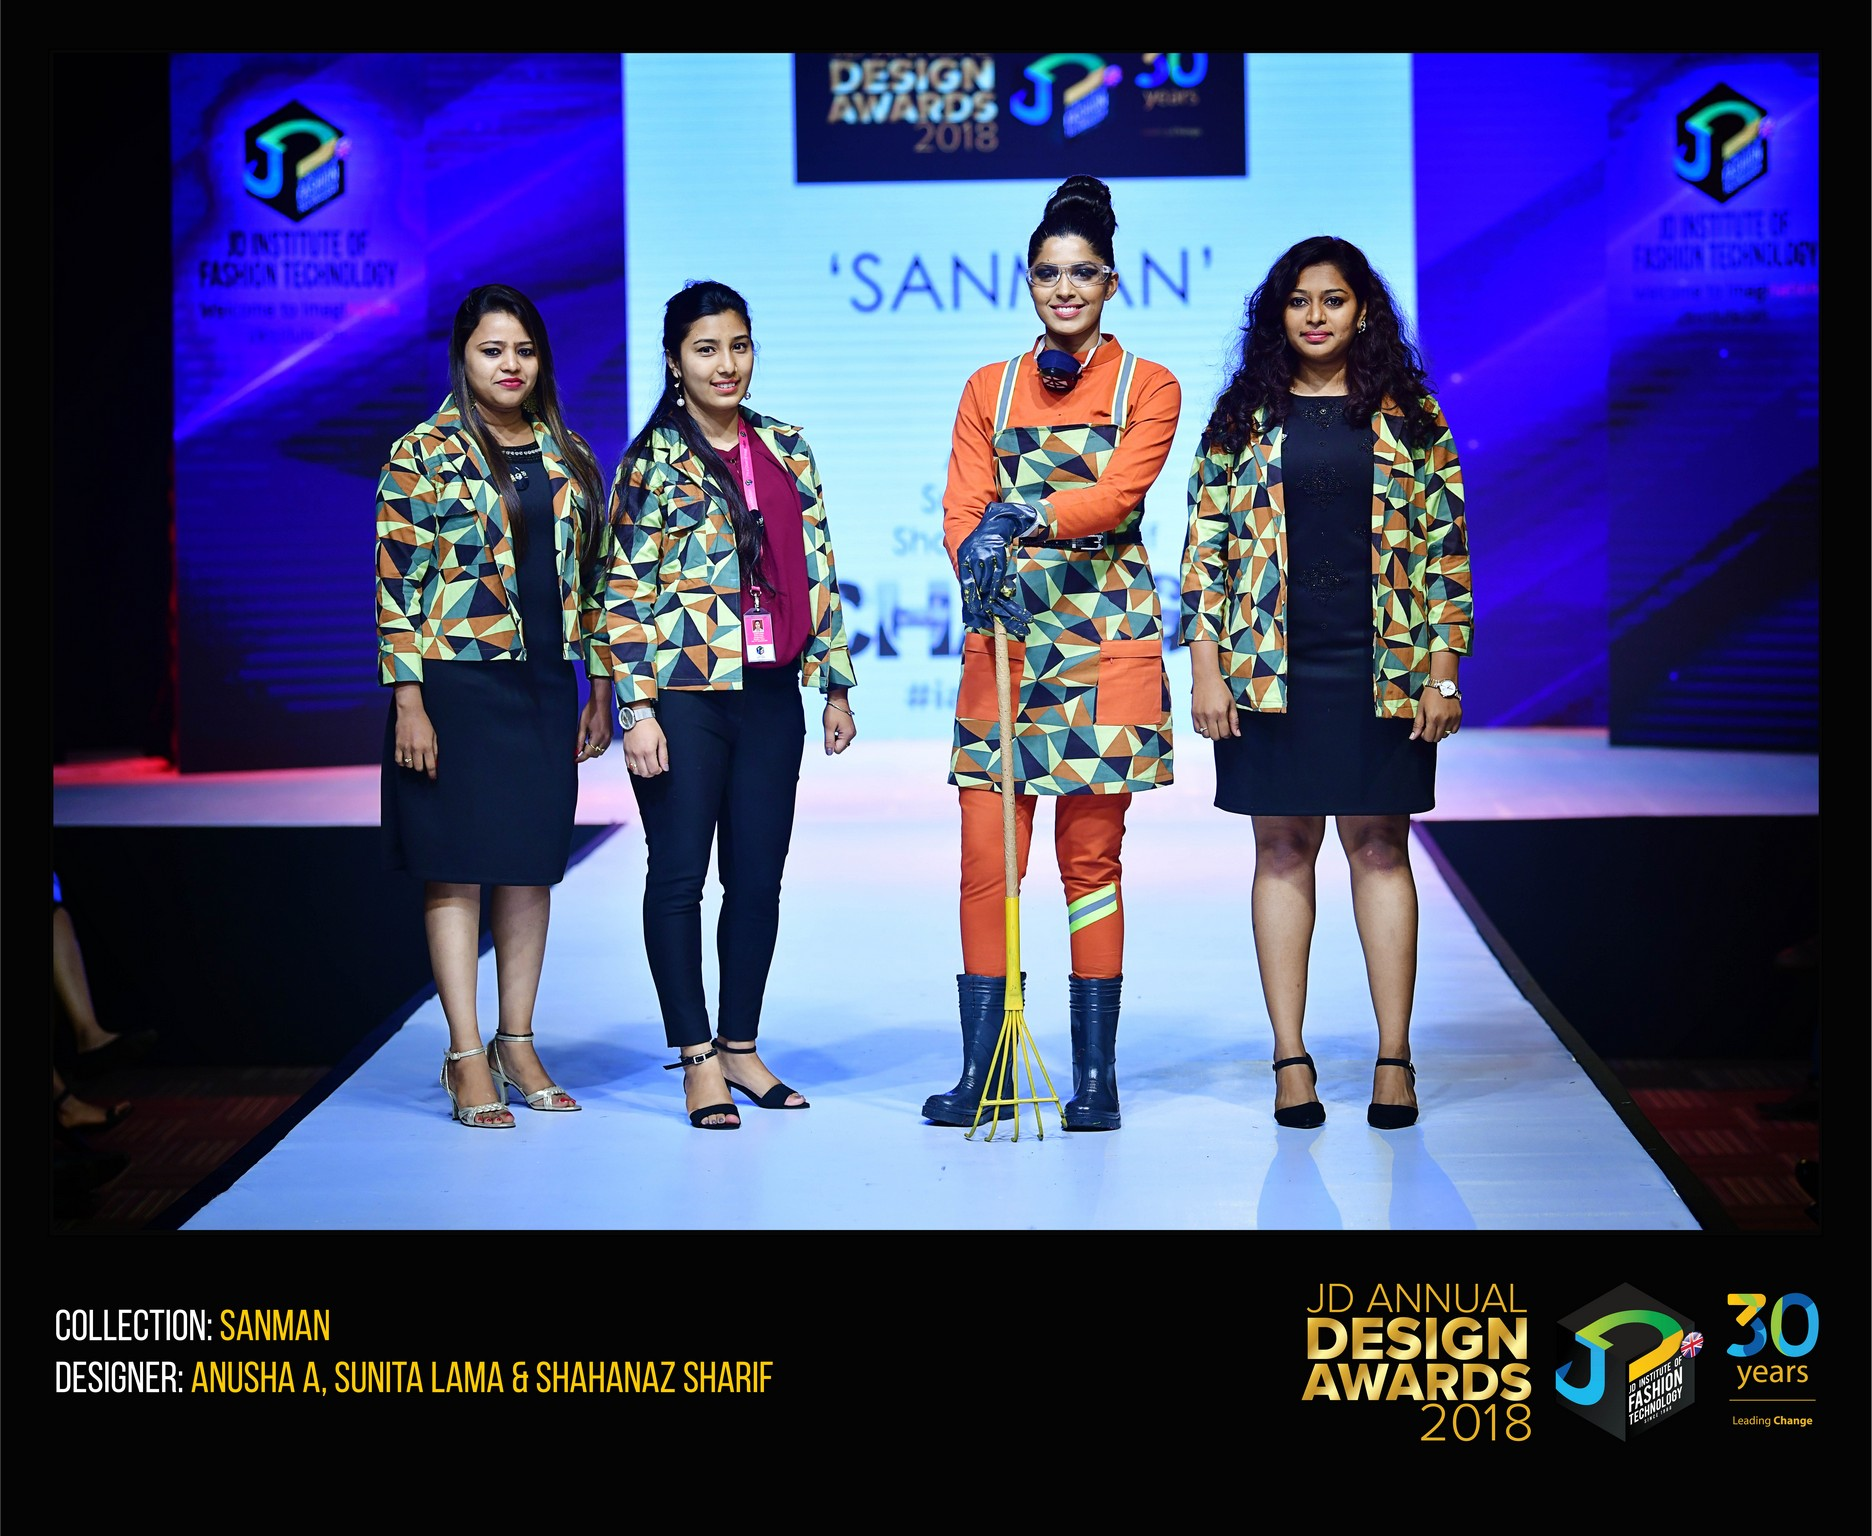 SanMan – Change – JD Annual Design Awards 2018 | Designer: Sunita, Shehnaz and Anusha | Photography : Jerin Nath (@jerin_nath) sanman - SANMAN 7 - SanMan – Change – JD Annual Design Awards 2018